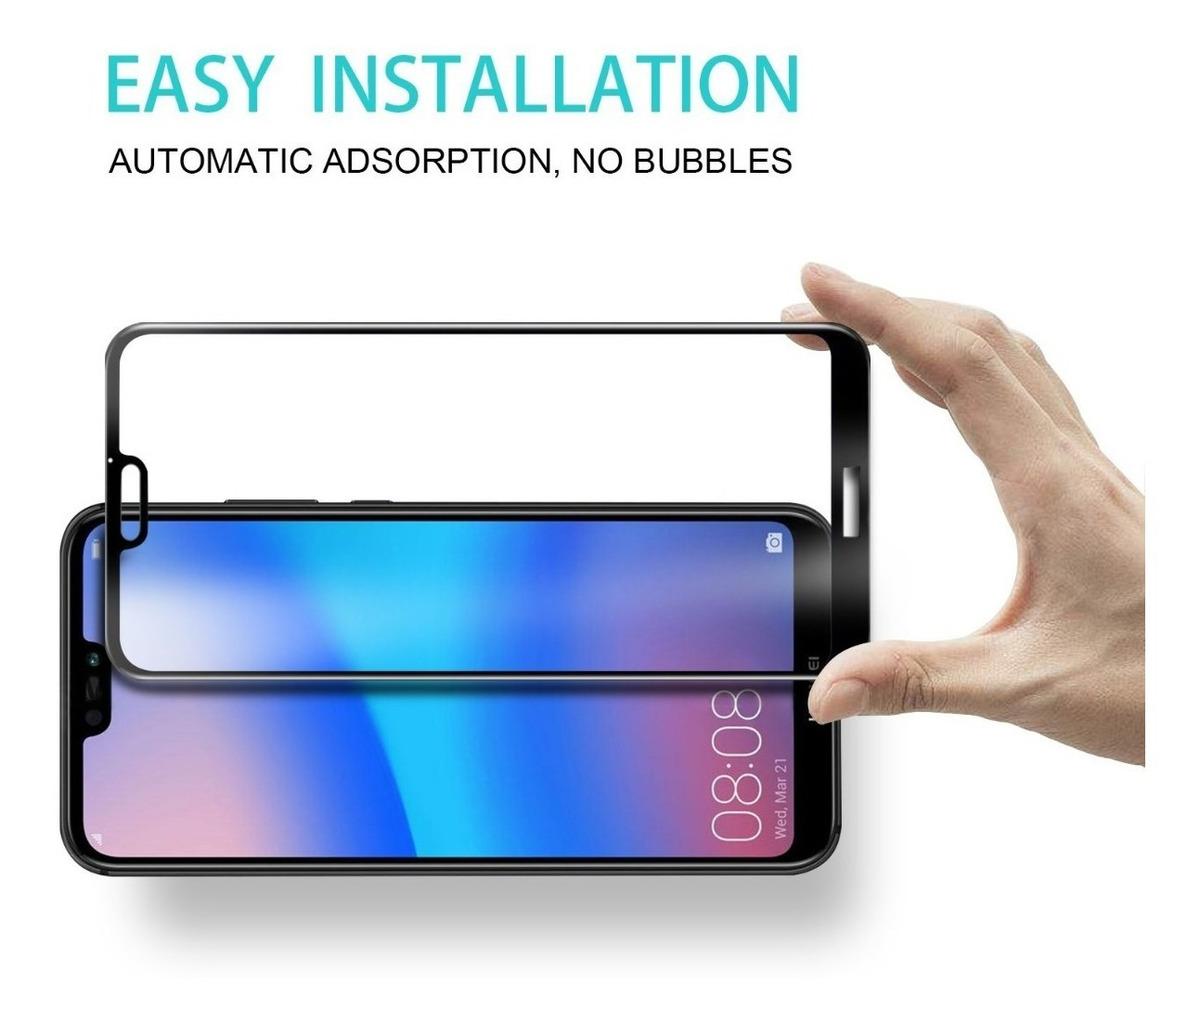 Glass Templado Huawei P20 Lite P20 Pro P20 3d Curvo + Envio